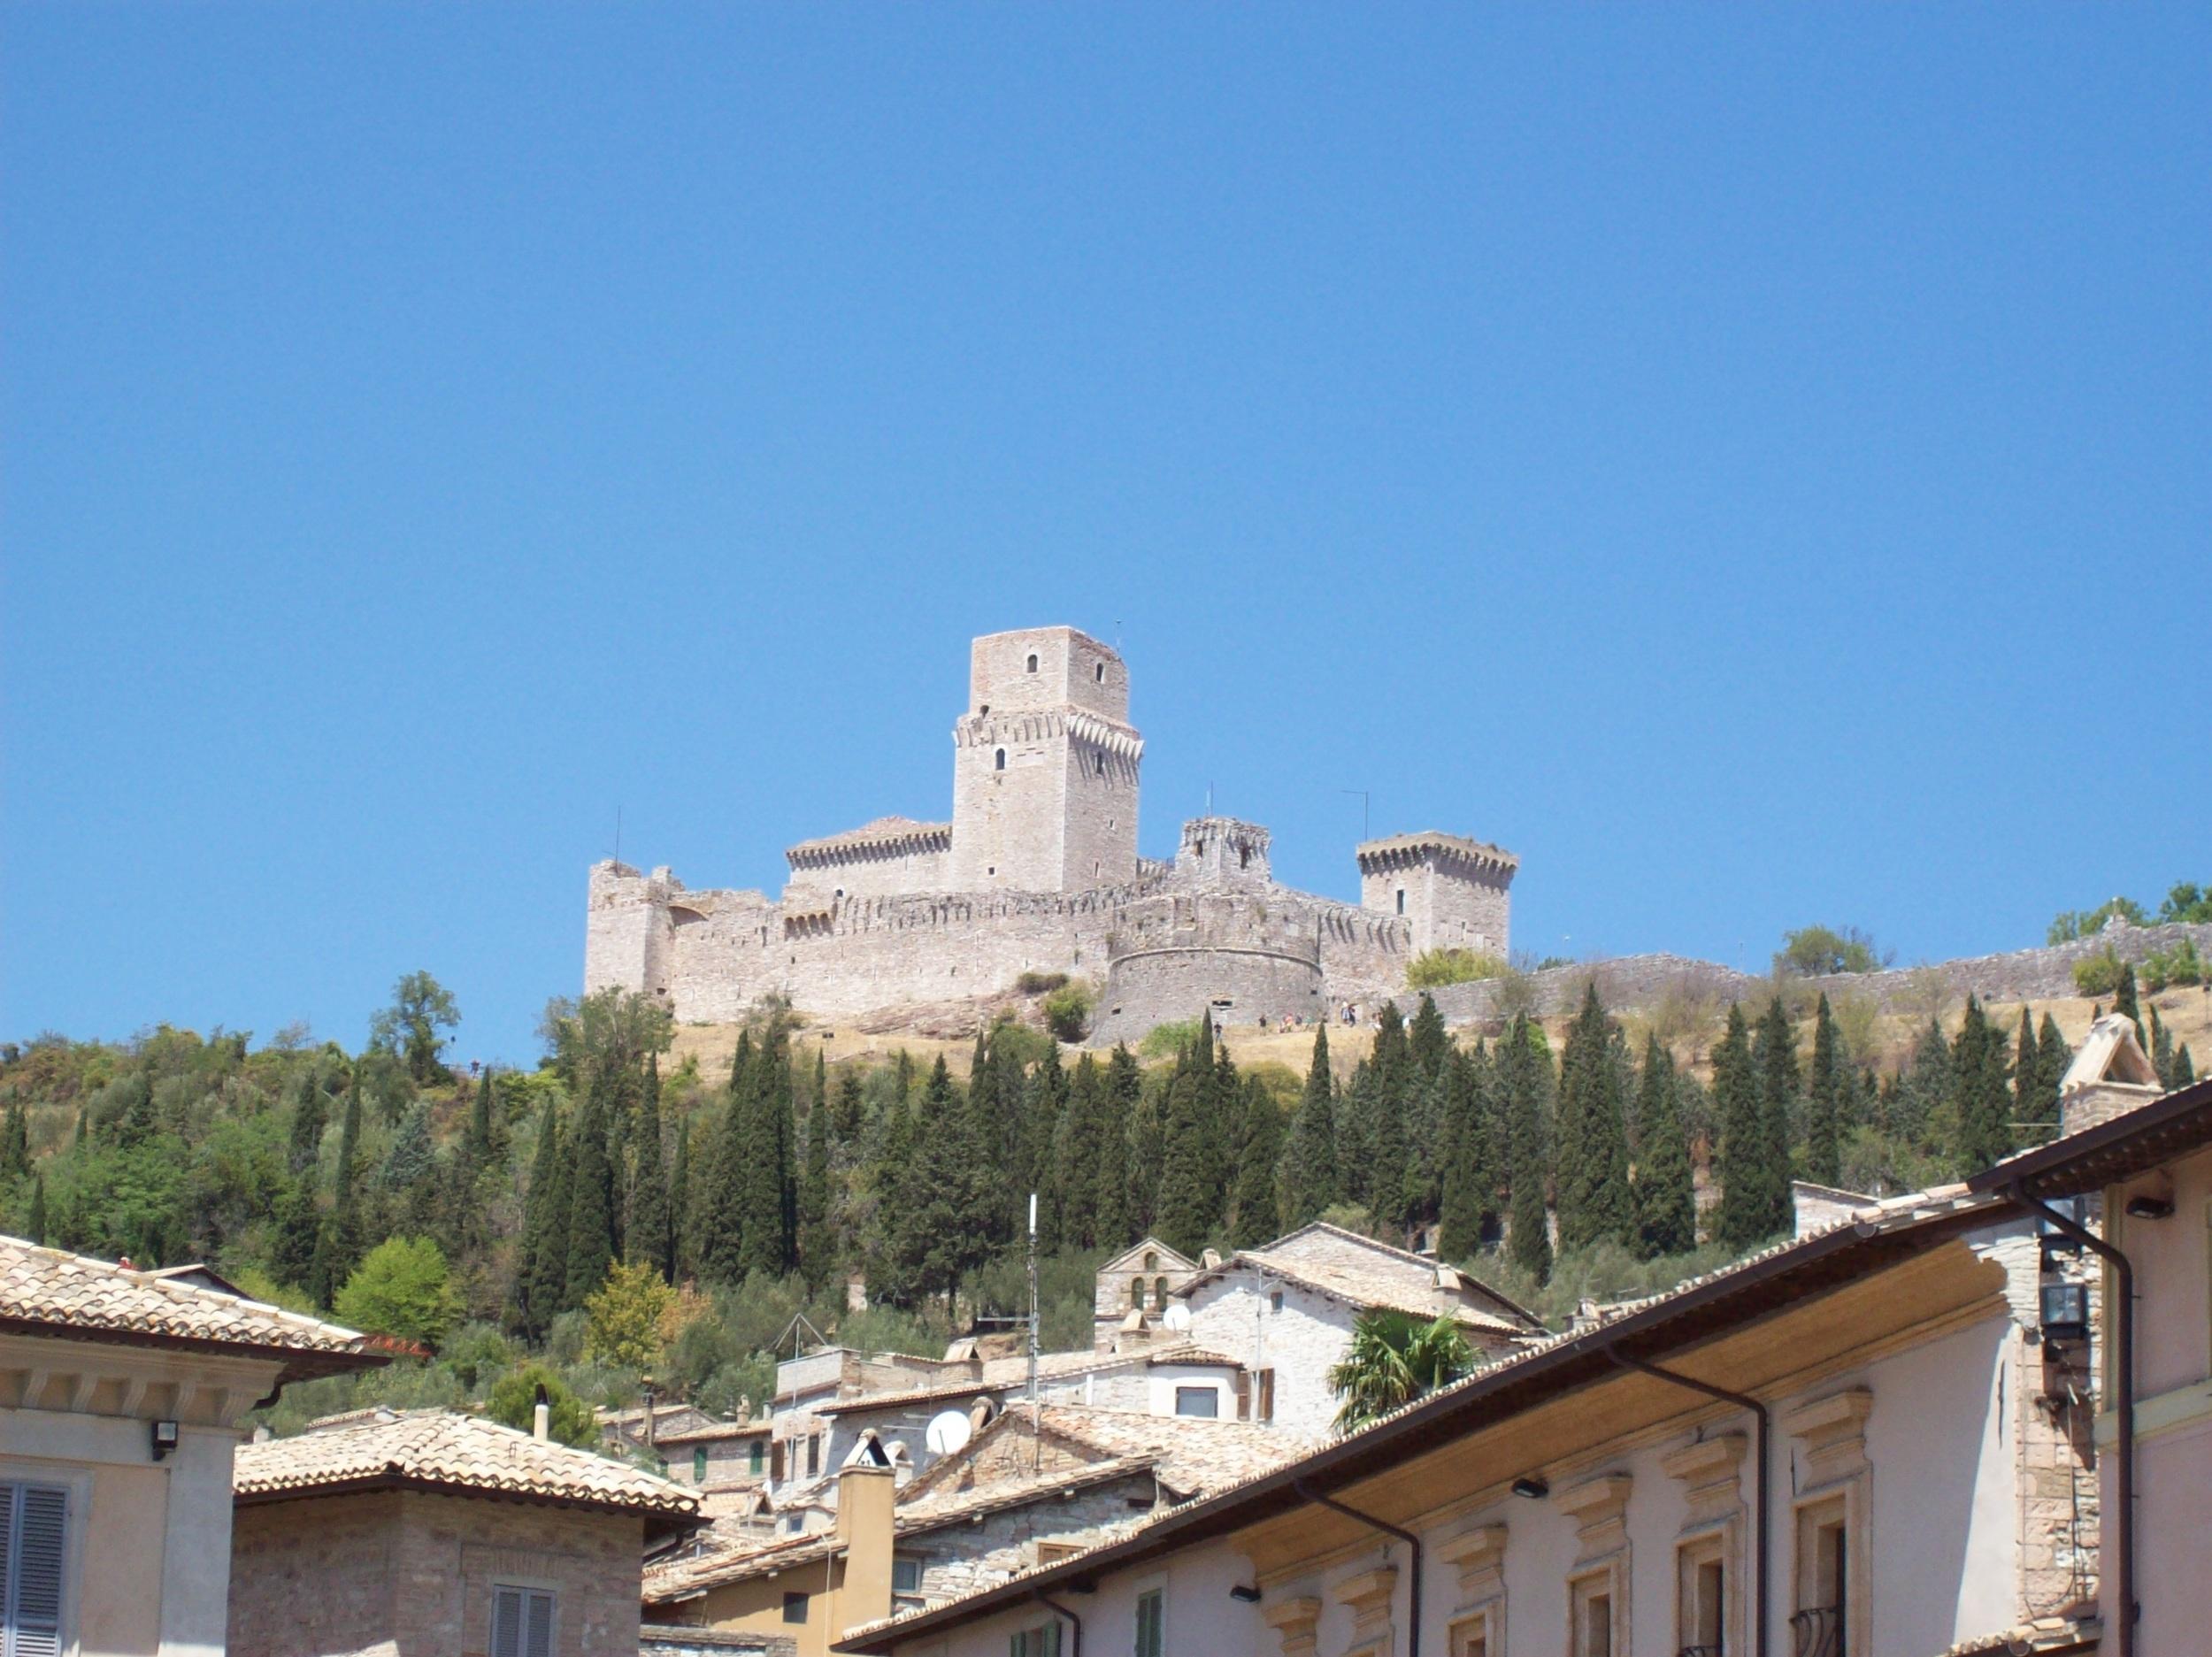 CRO Italy web 2012 - 14.JPG